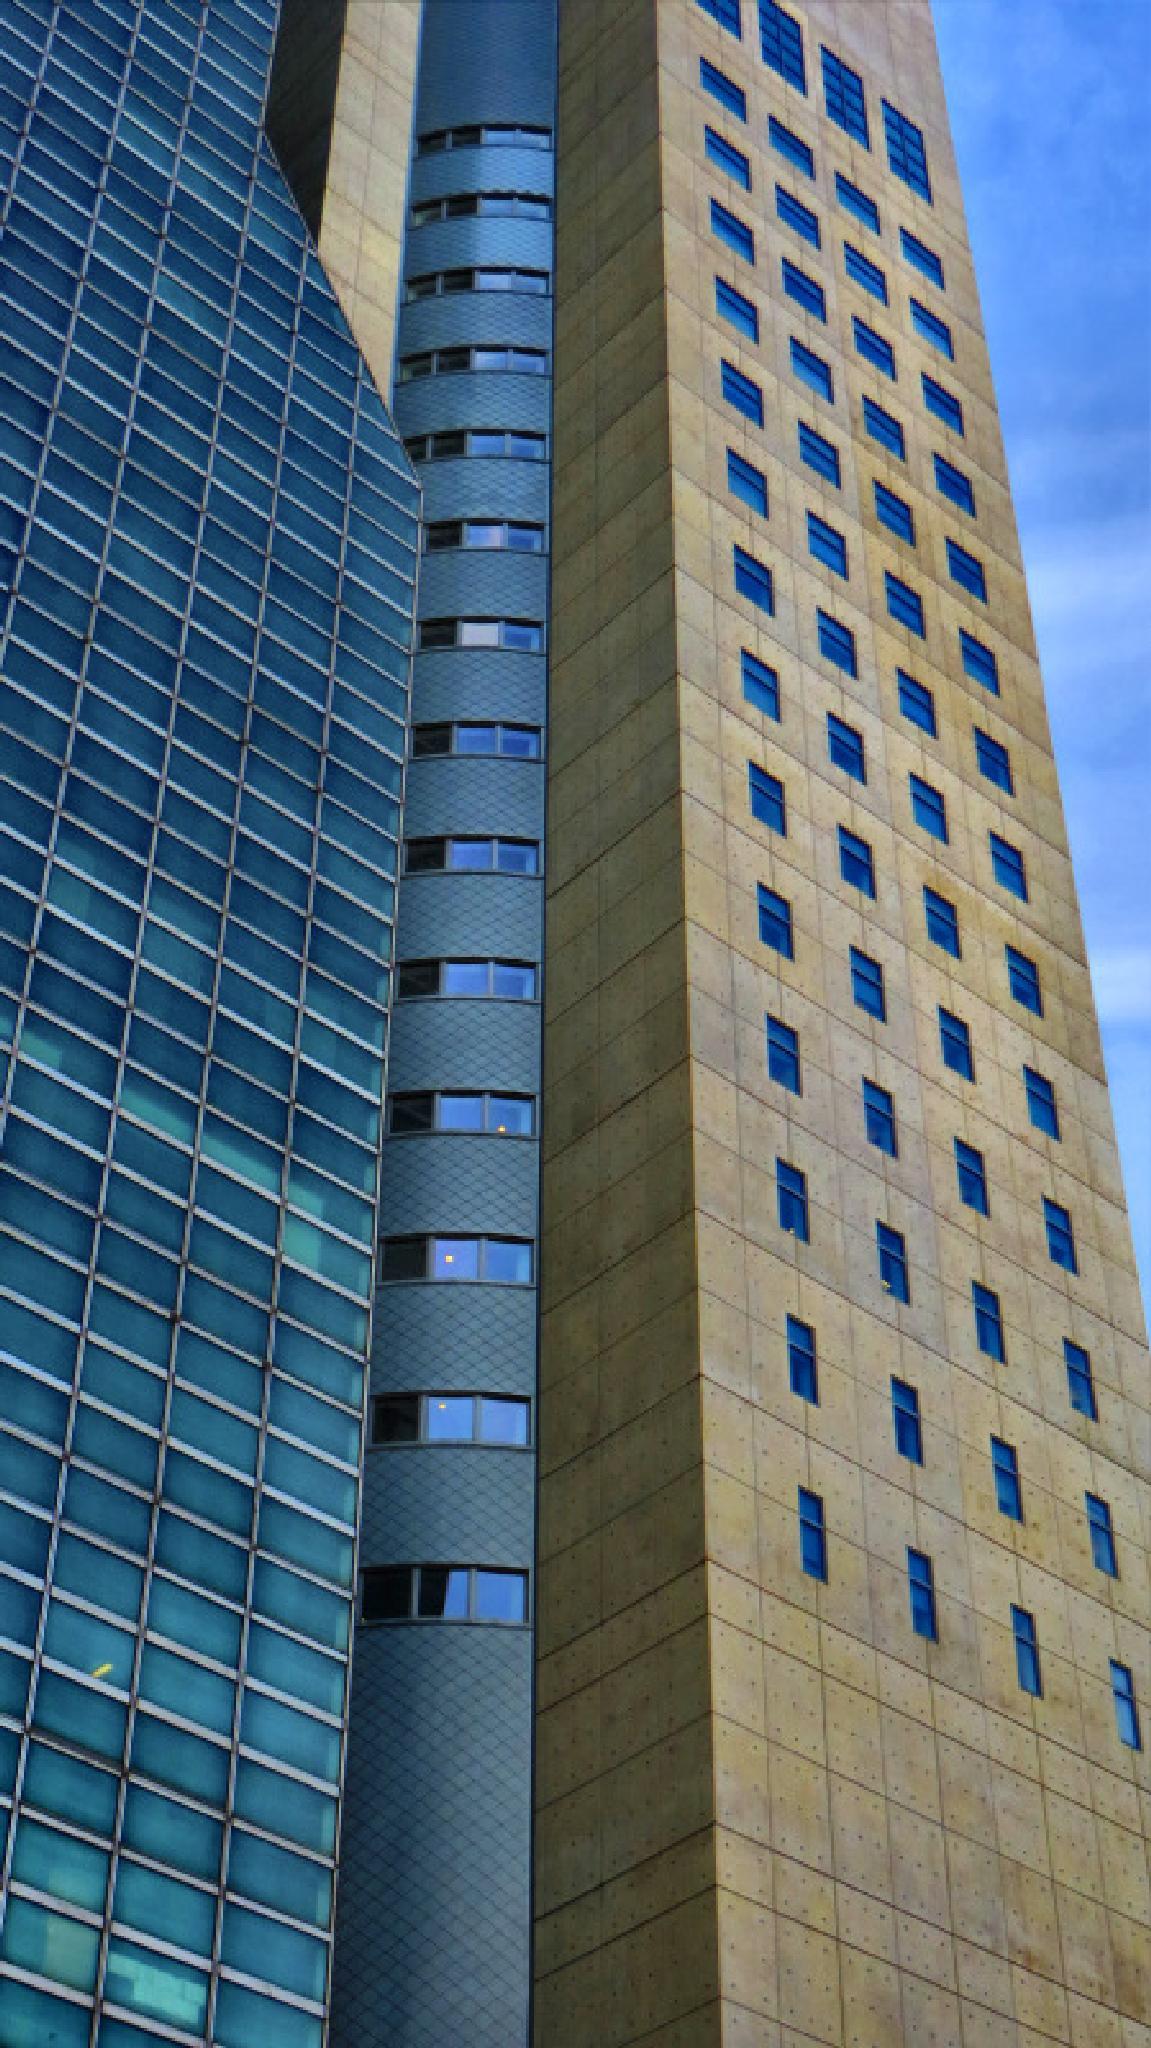 New York architecture by jezevec40